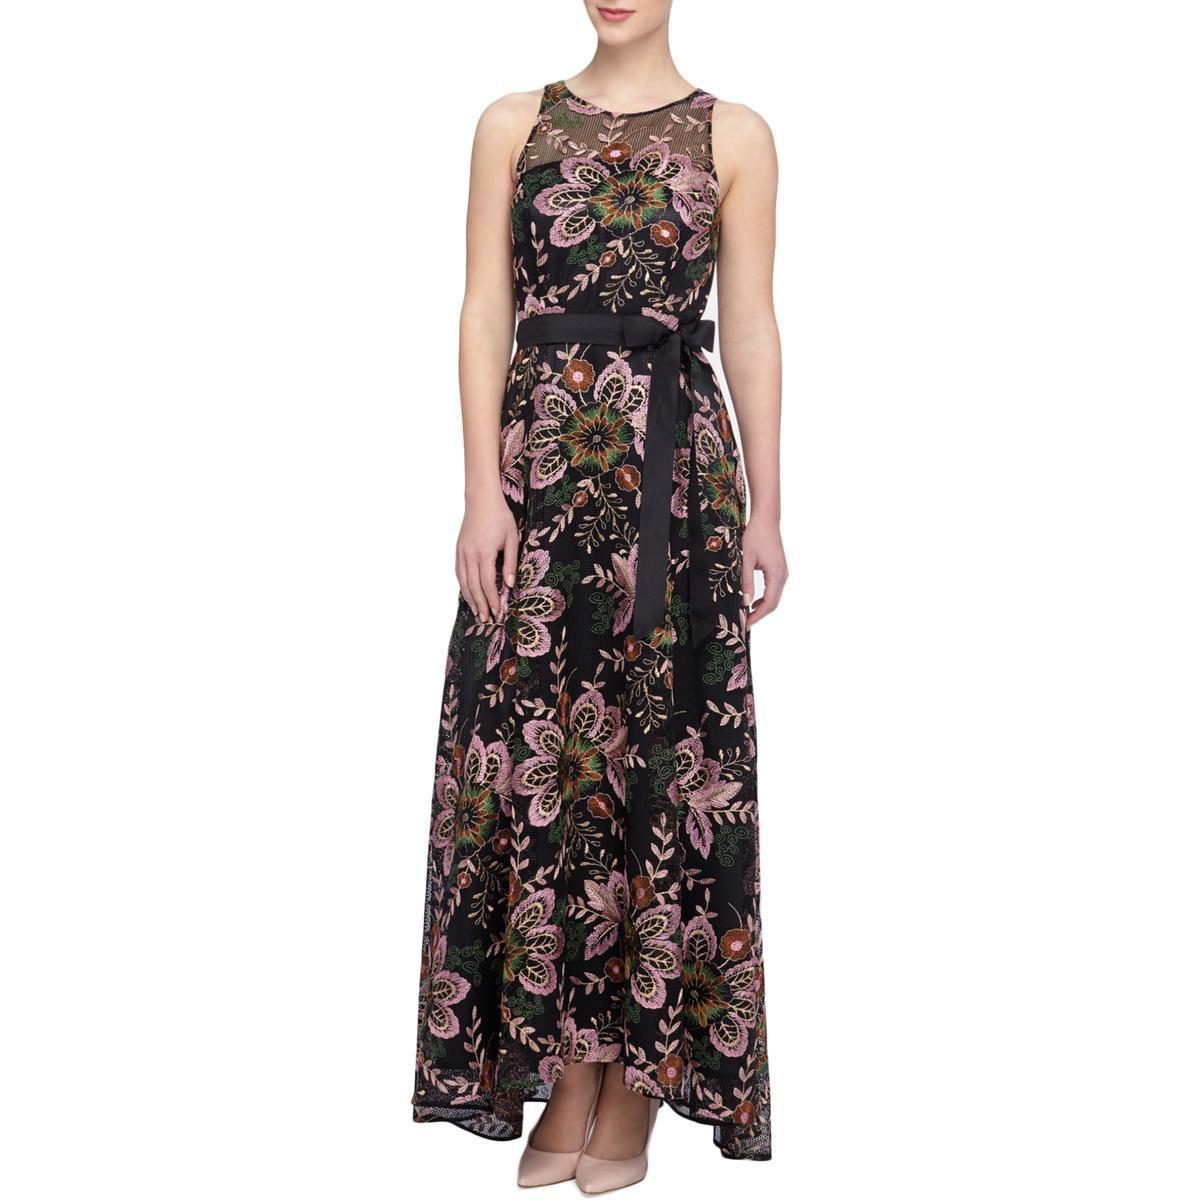 282f332466d5 Tahari. Black Tahari Asl Womens Floral Embroidered Lace Overlay Evening  Dress